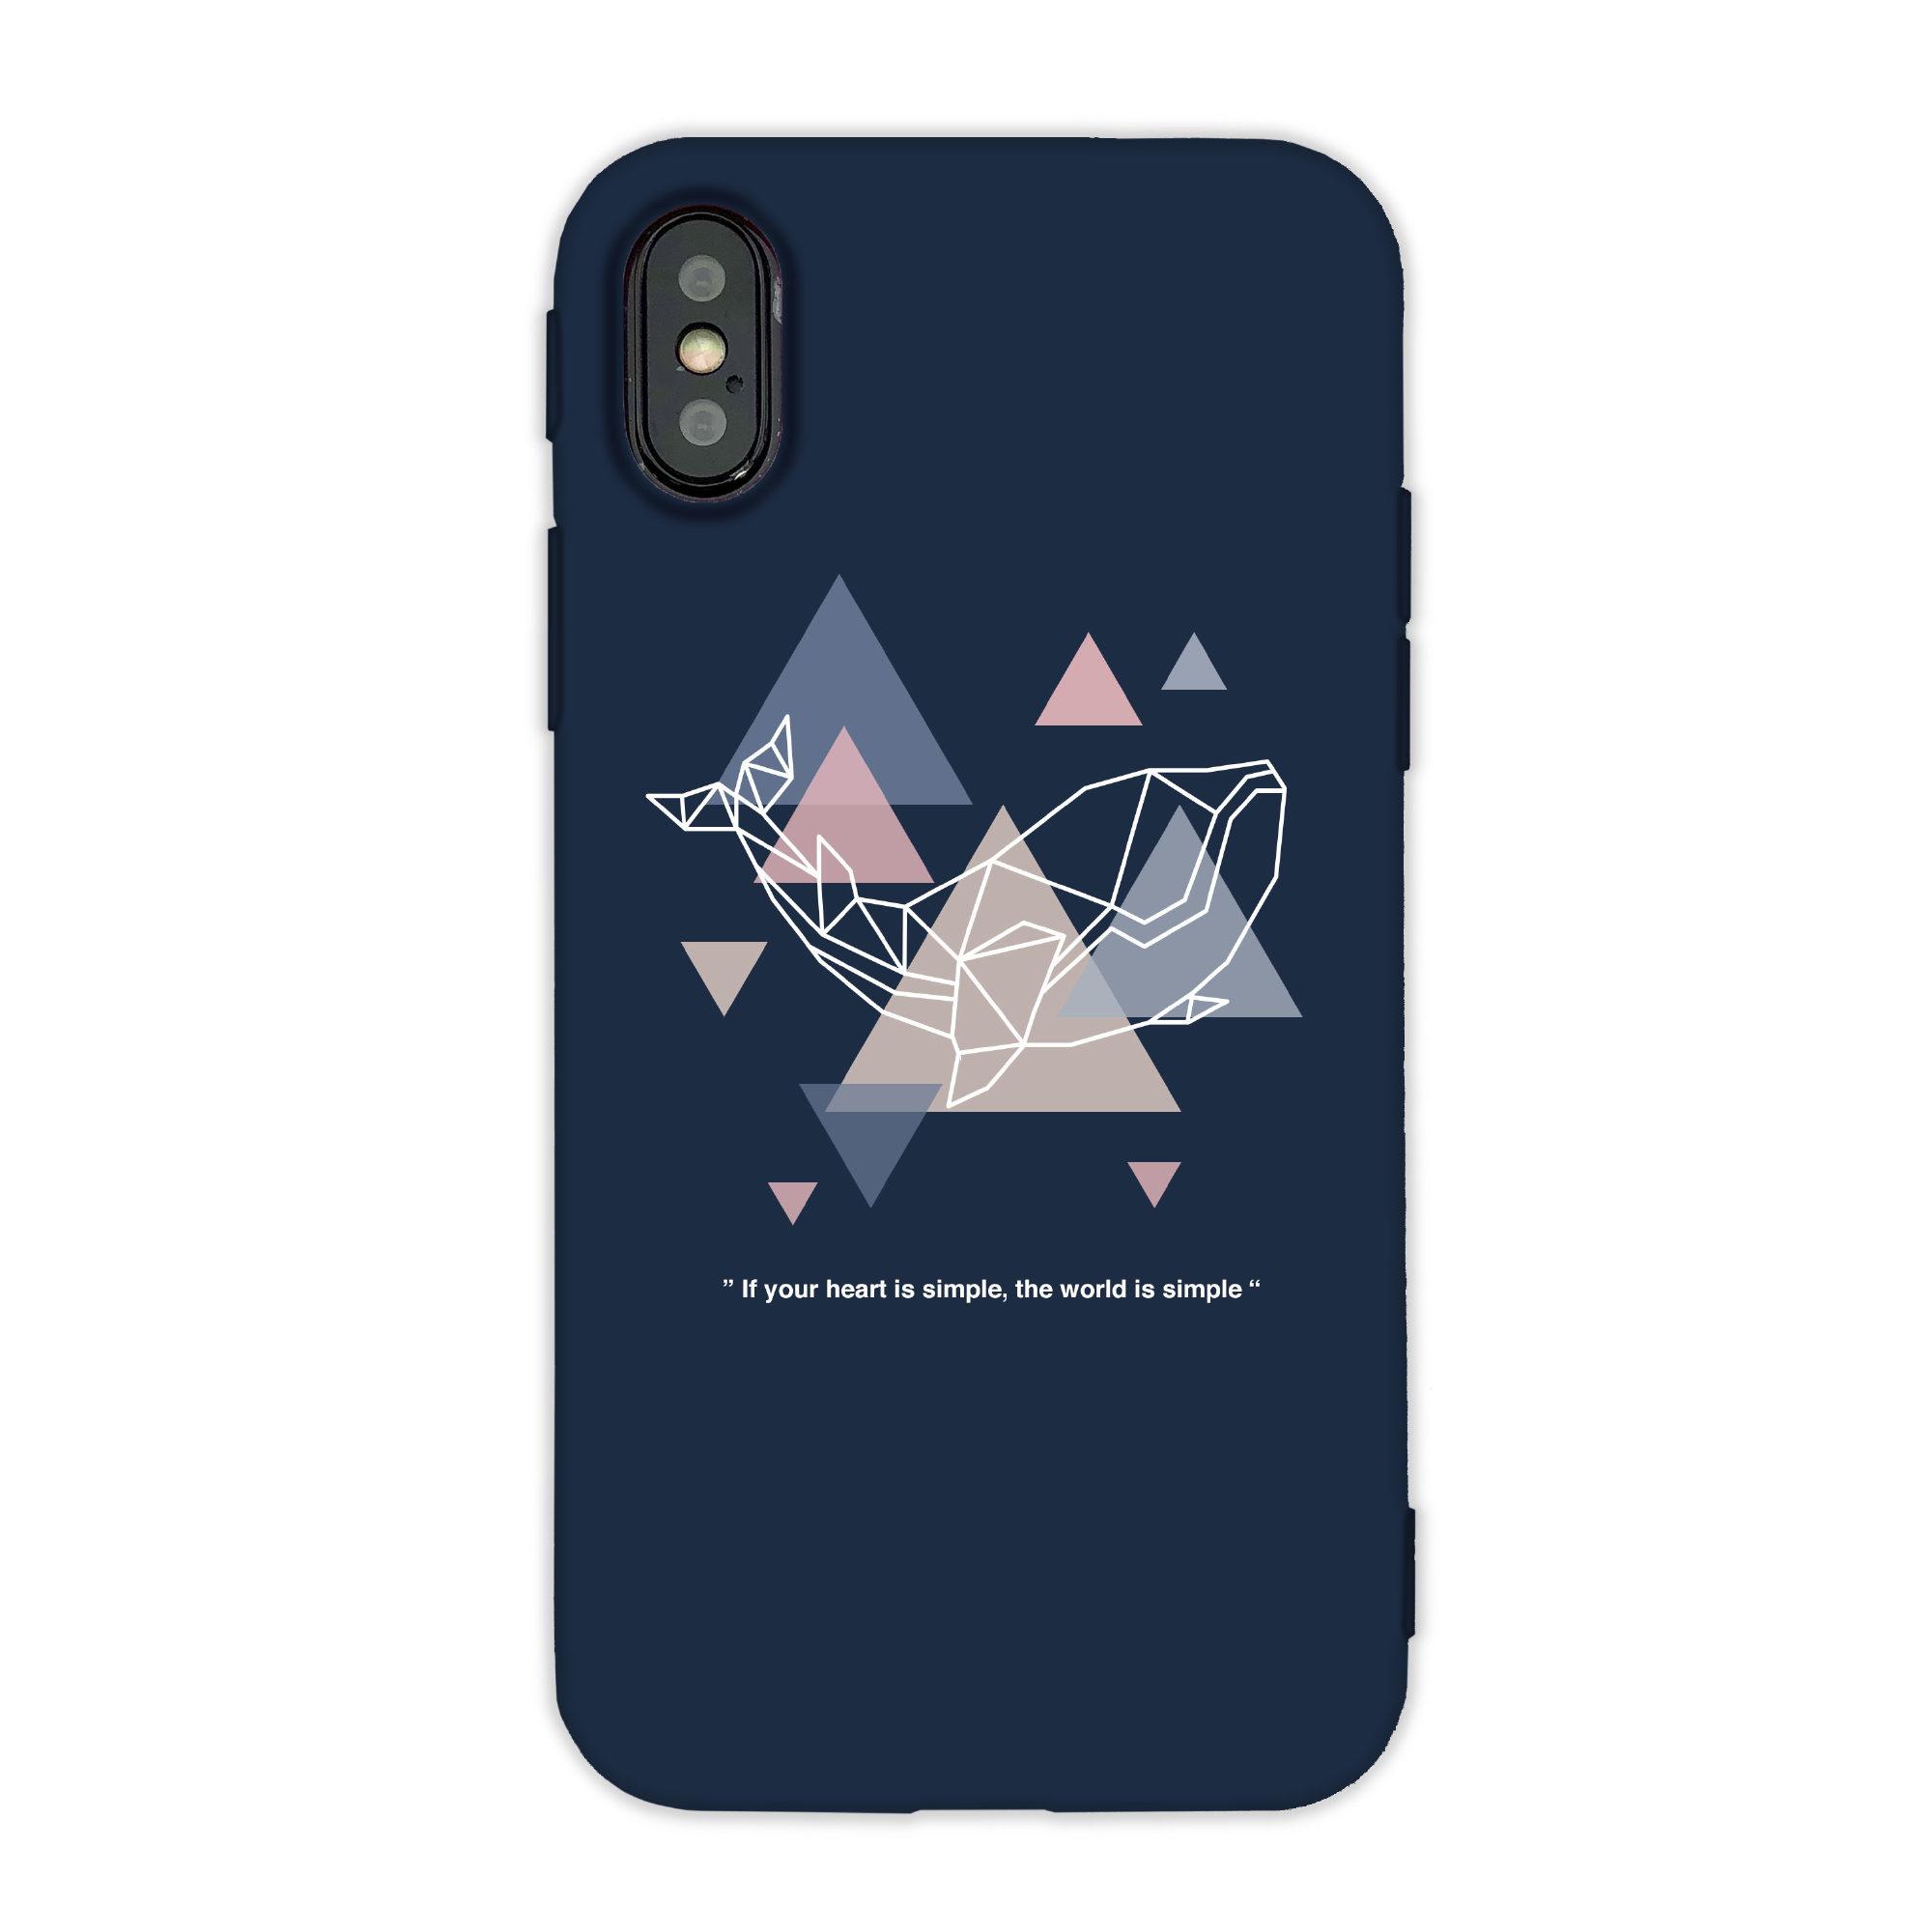 幾何三角Design動物iPhone手機殼